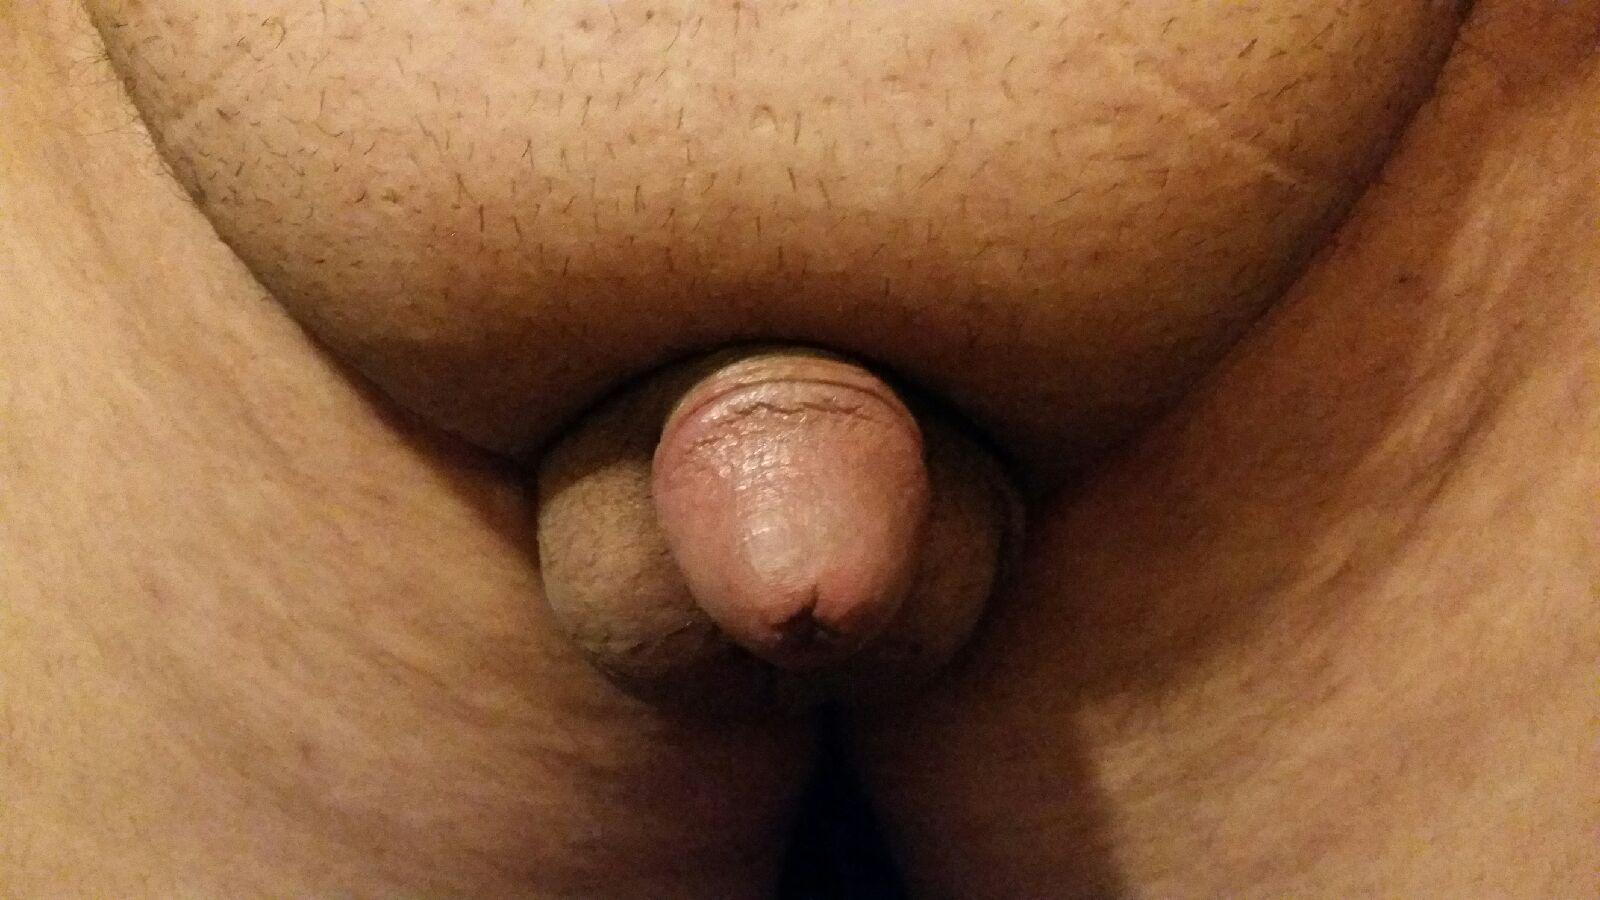 Clit dick